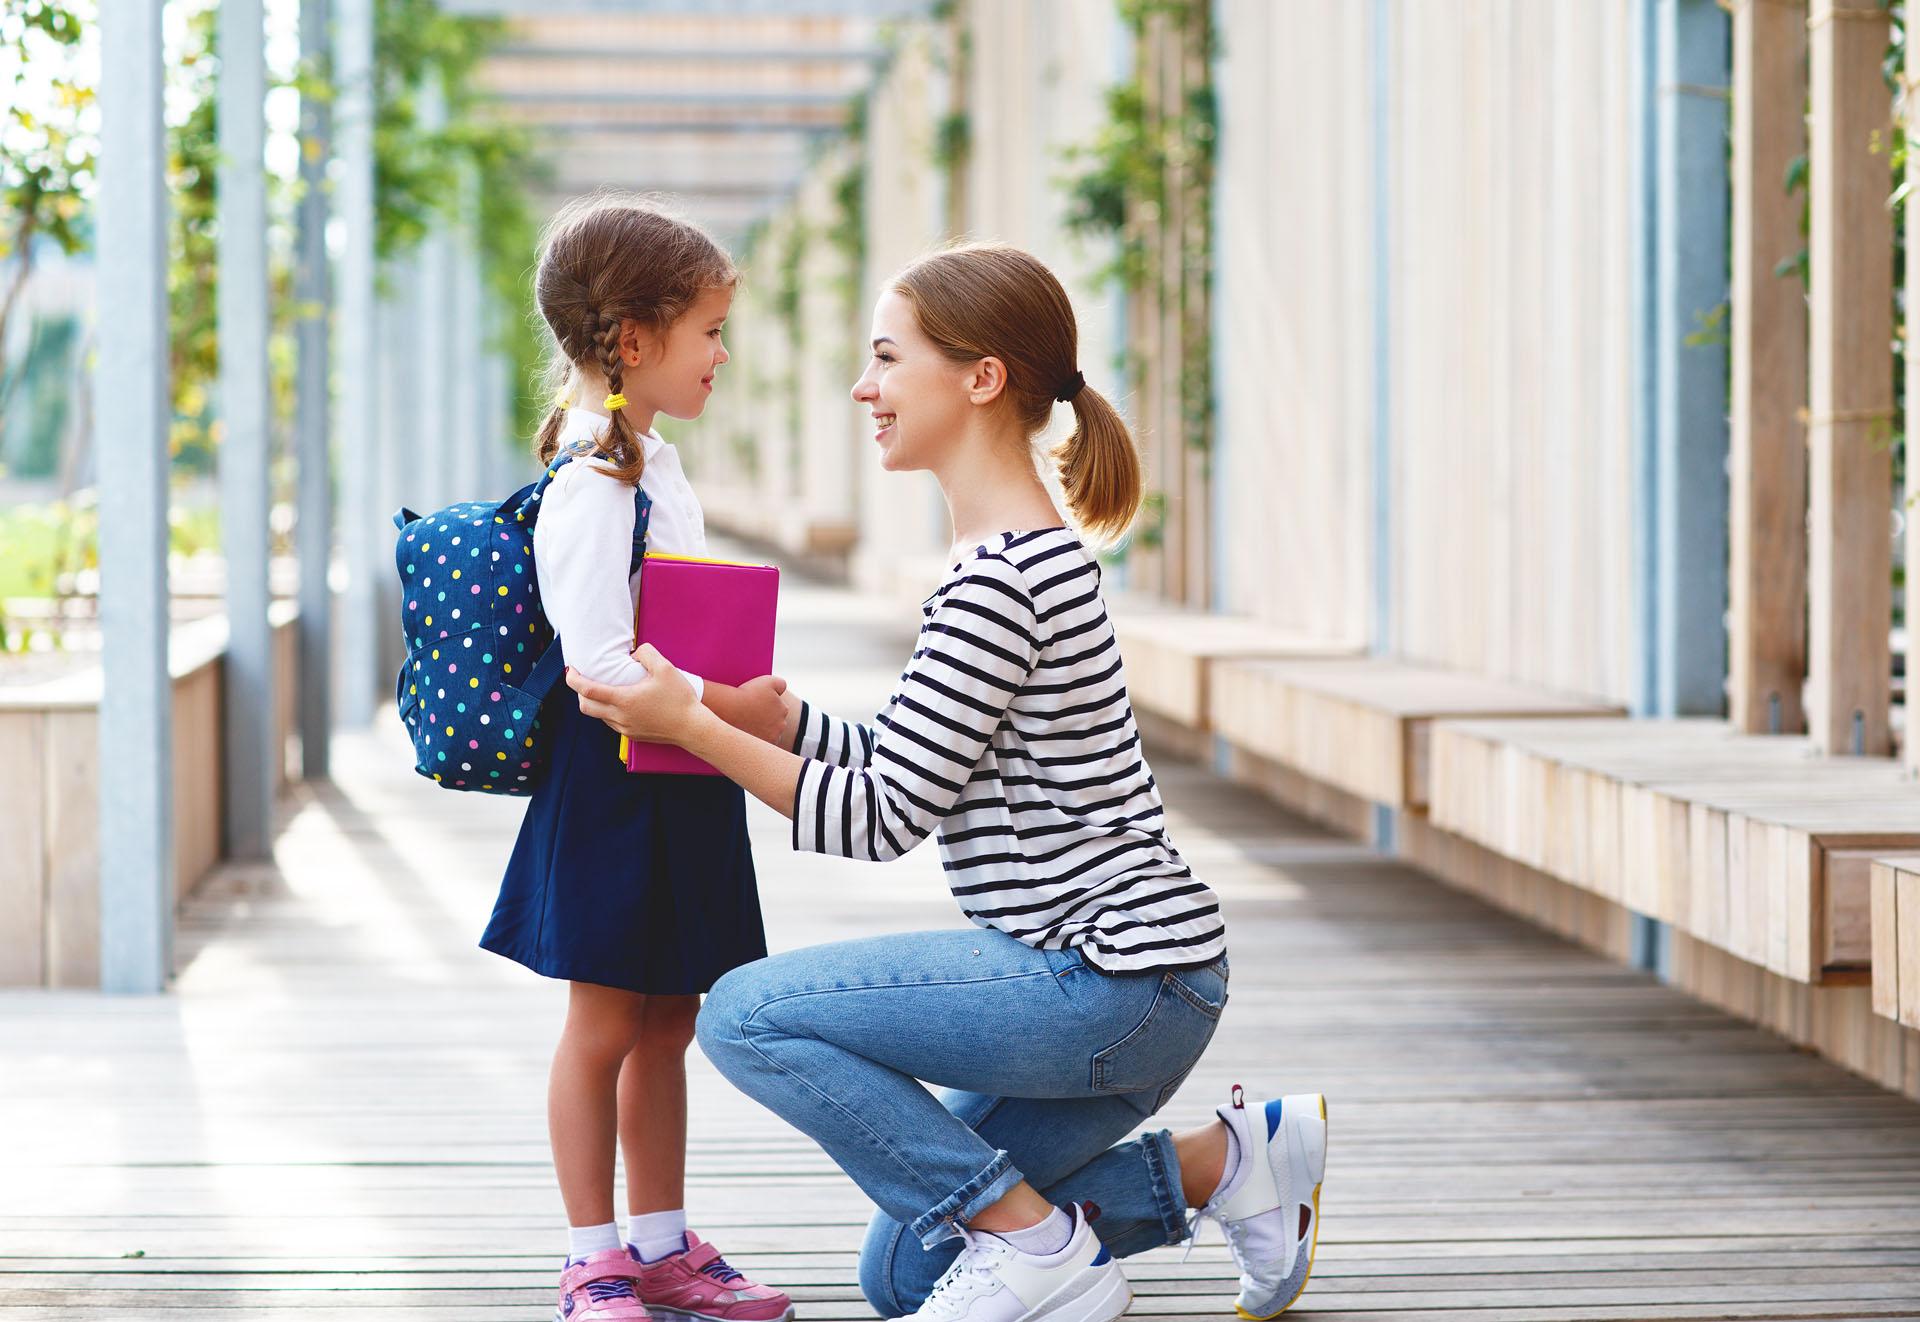 metier-accompagnateur-educatif-social